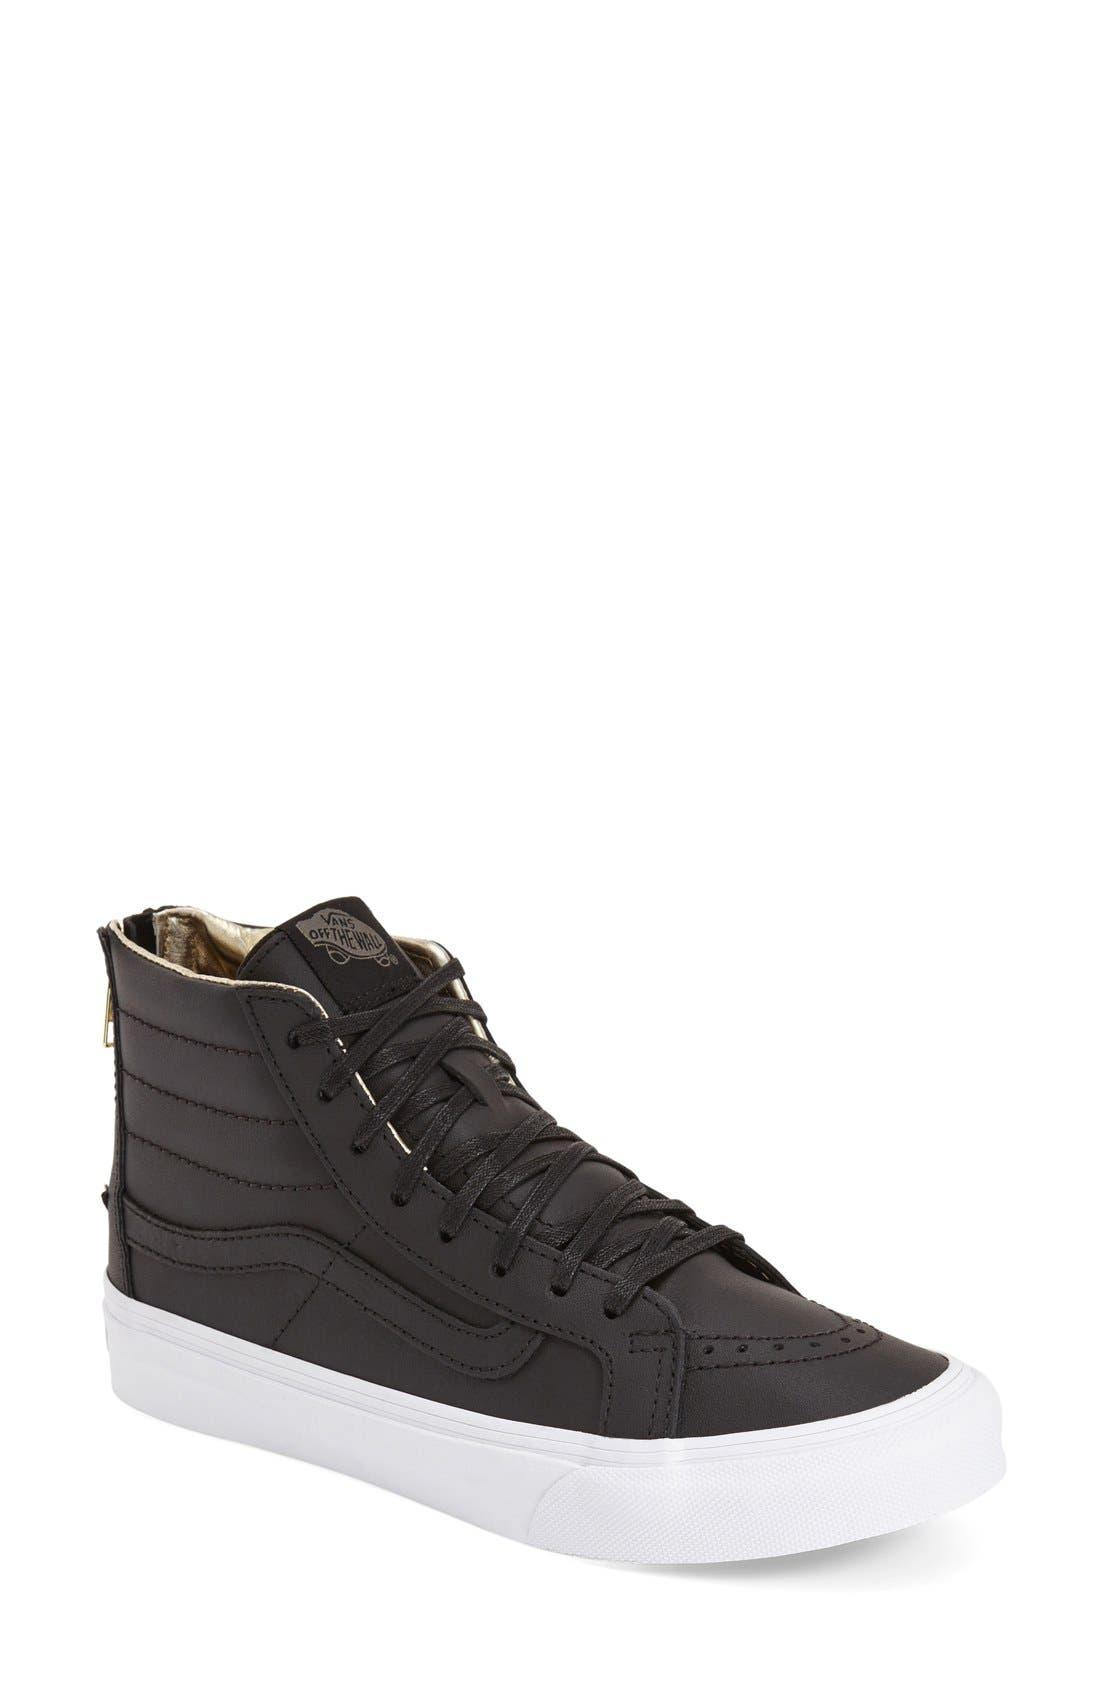 Main Image - Vans 'Sk8-Hi Slim' Zip Sneaker (Women)